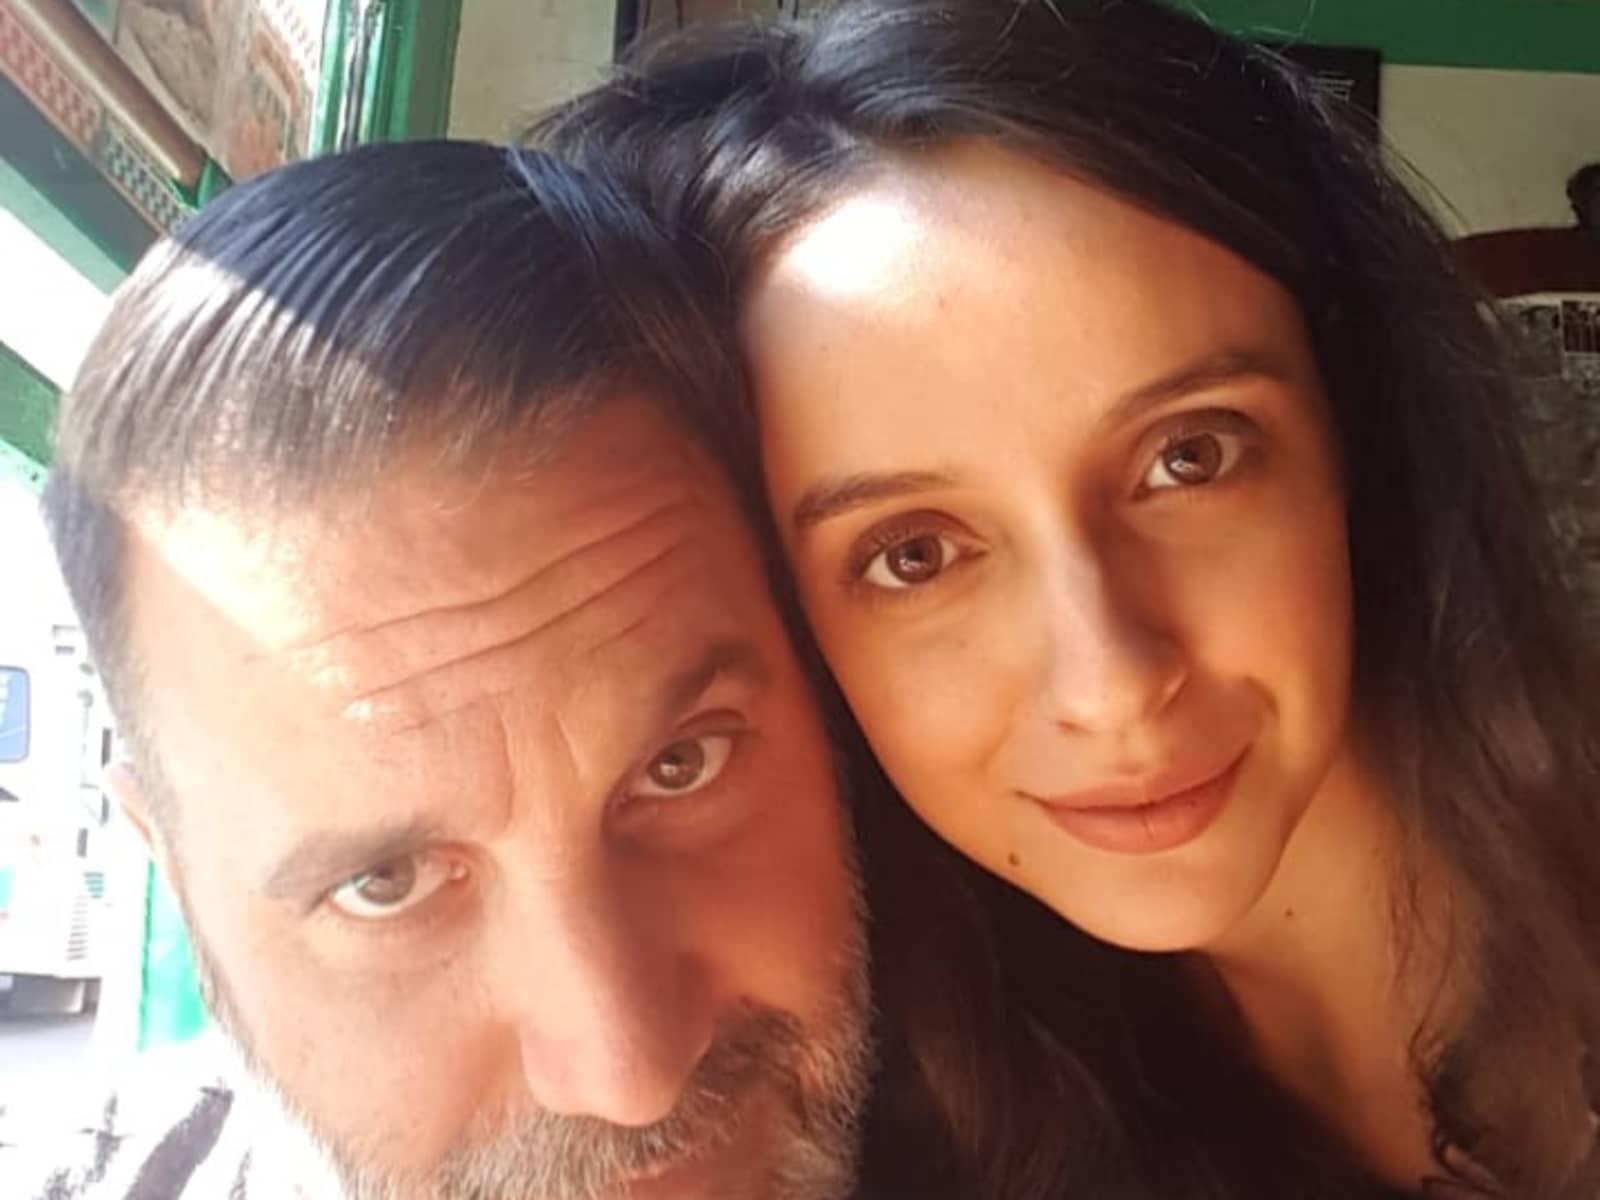 Anthony & Sabrina from Plovdiv, Bulgaria